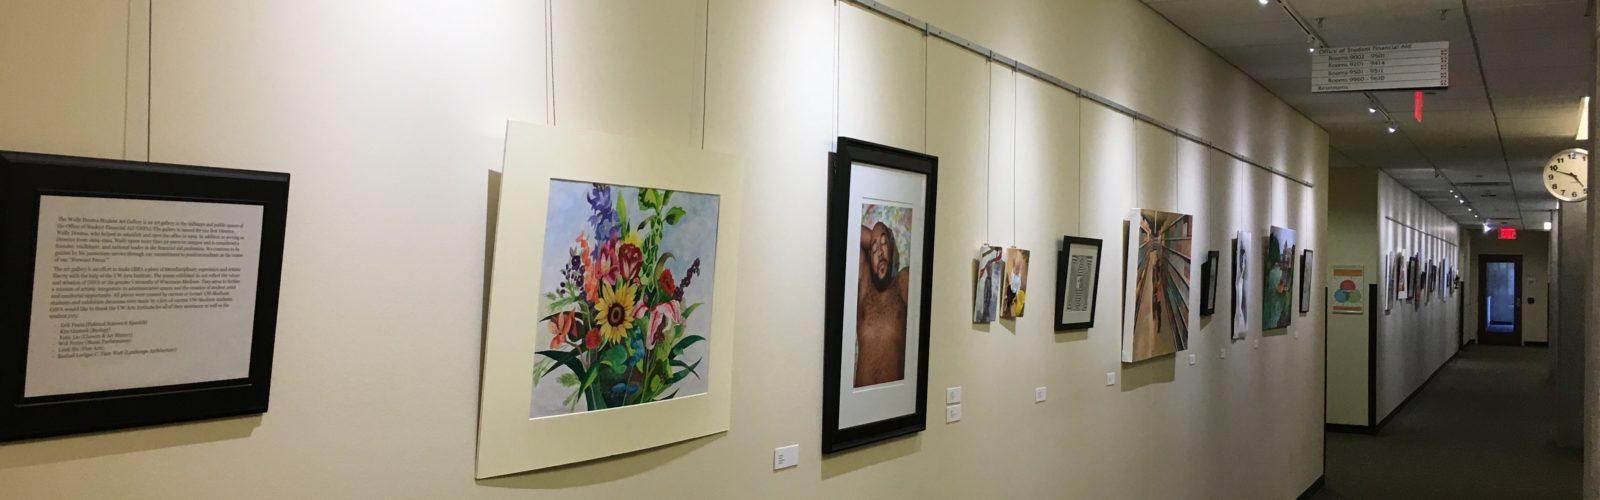 Wally Douma Student Art Gallery